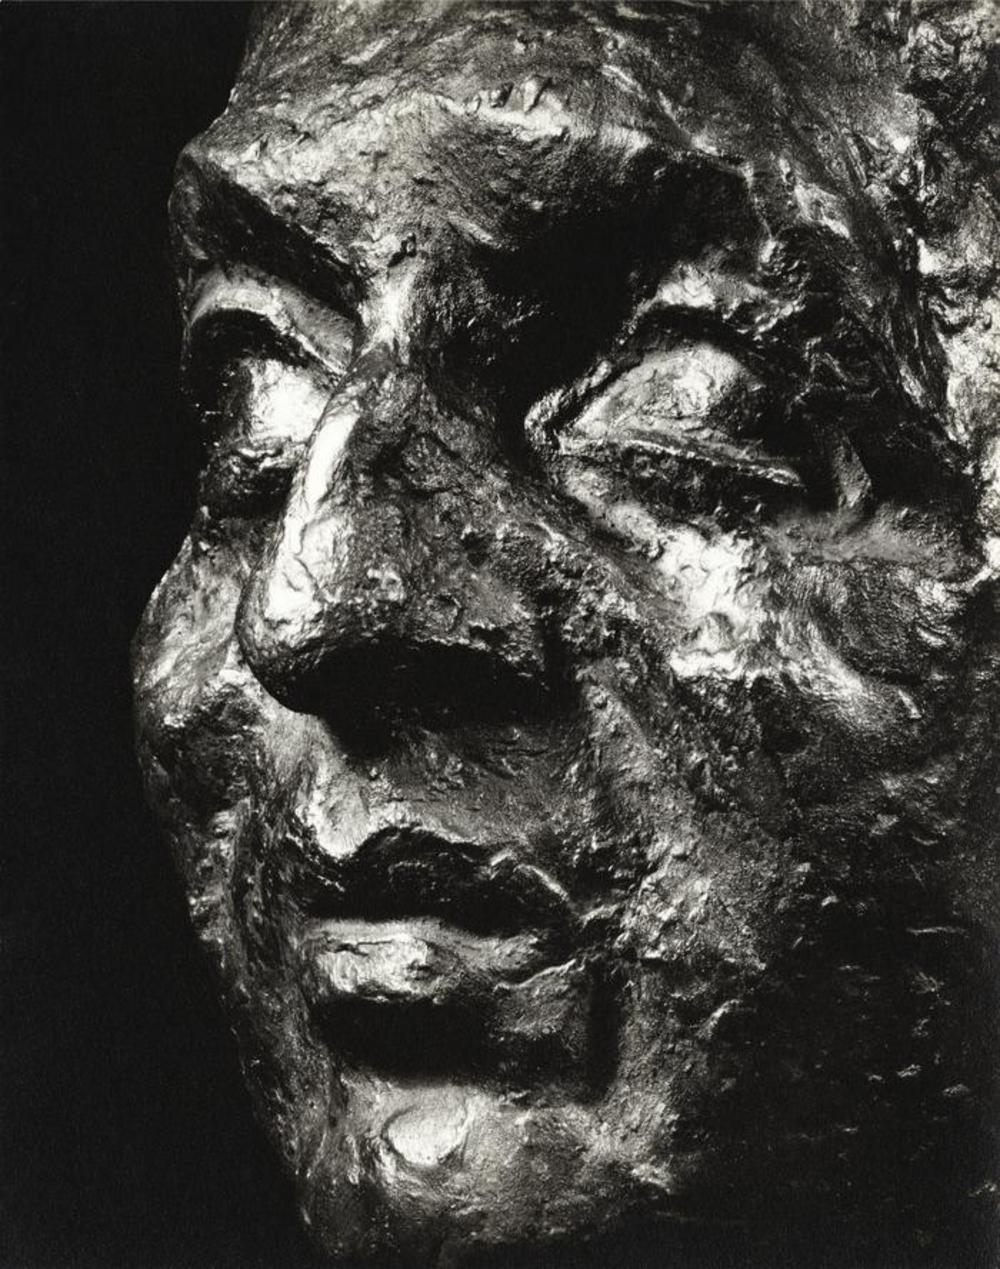 J. B. Neumann, image 4